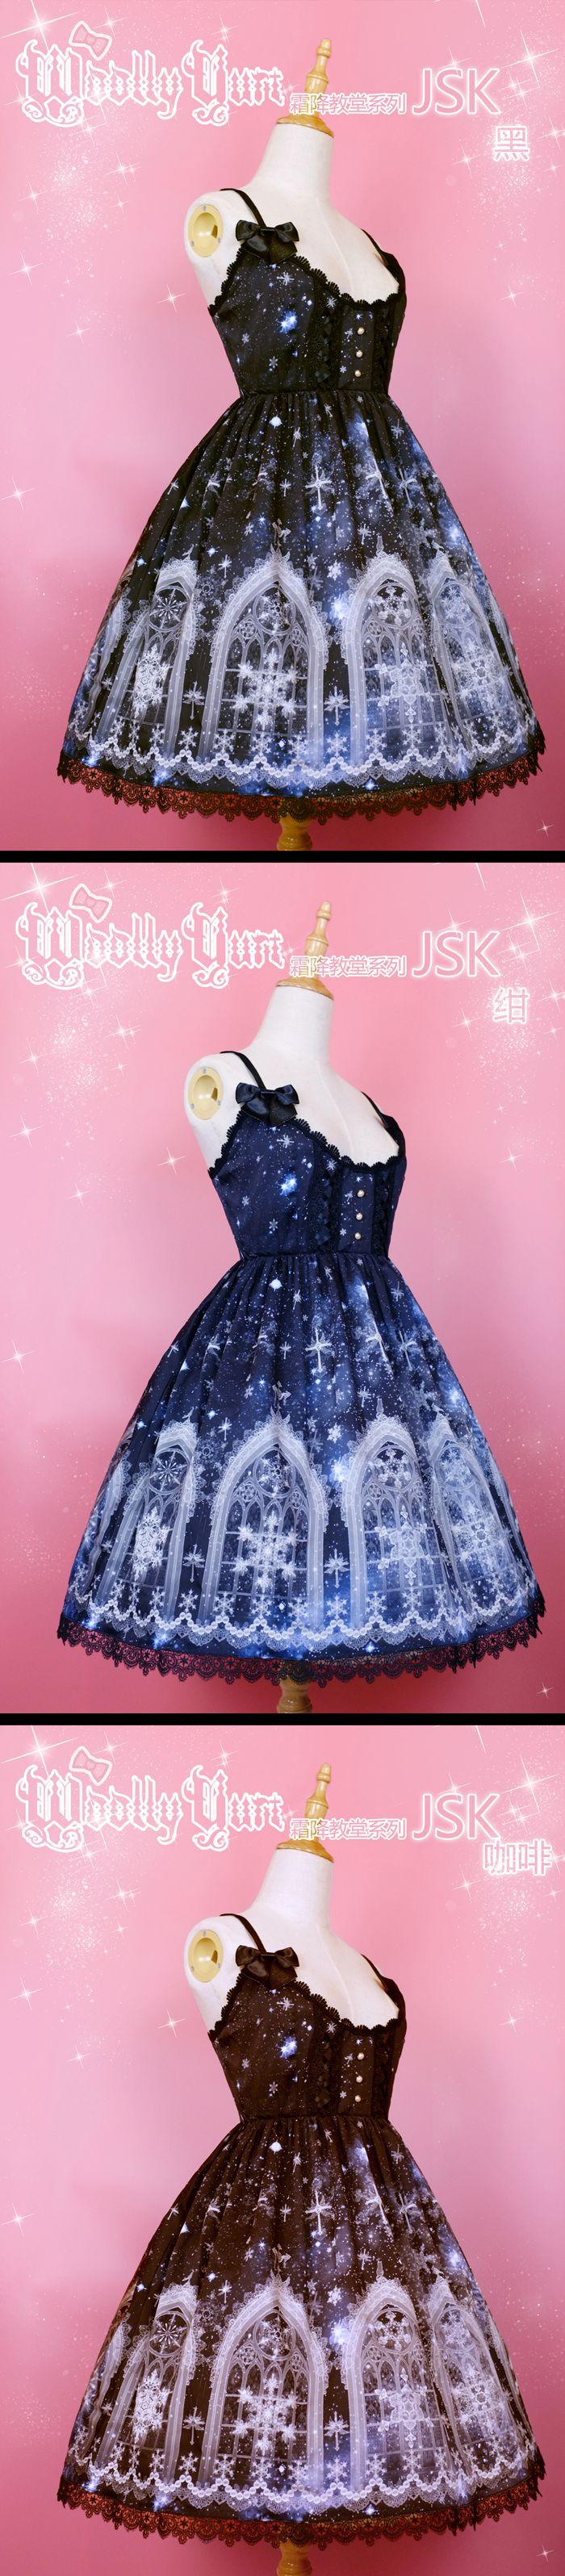 【JSK】【定金】woollyyurt原创lolita-霜降教堂-淘宝网